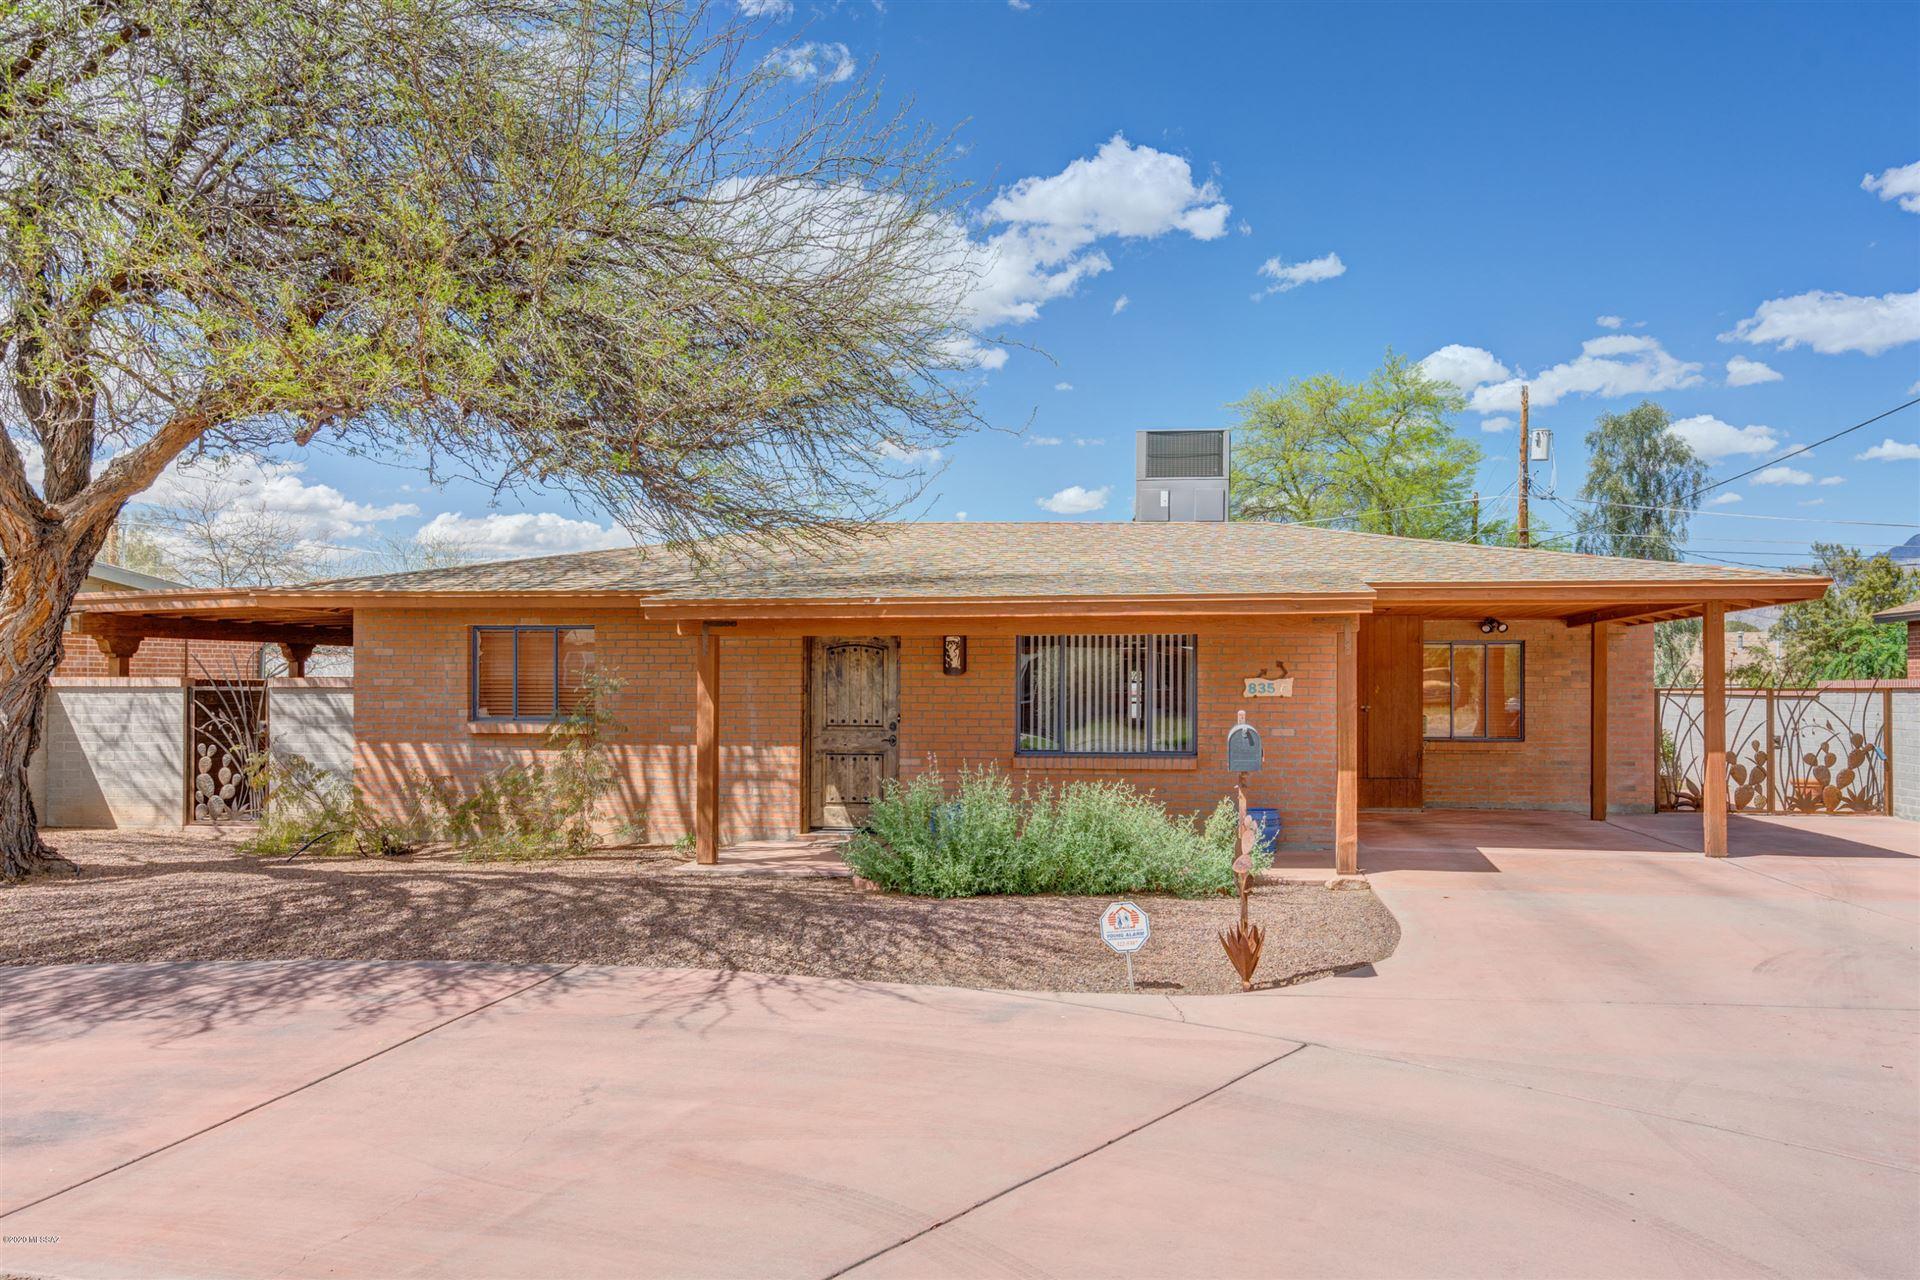 835 E Copper Street, Tucson, AZ 85719 - MLS#: 22009656